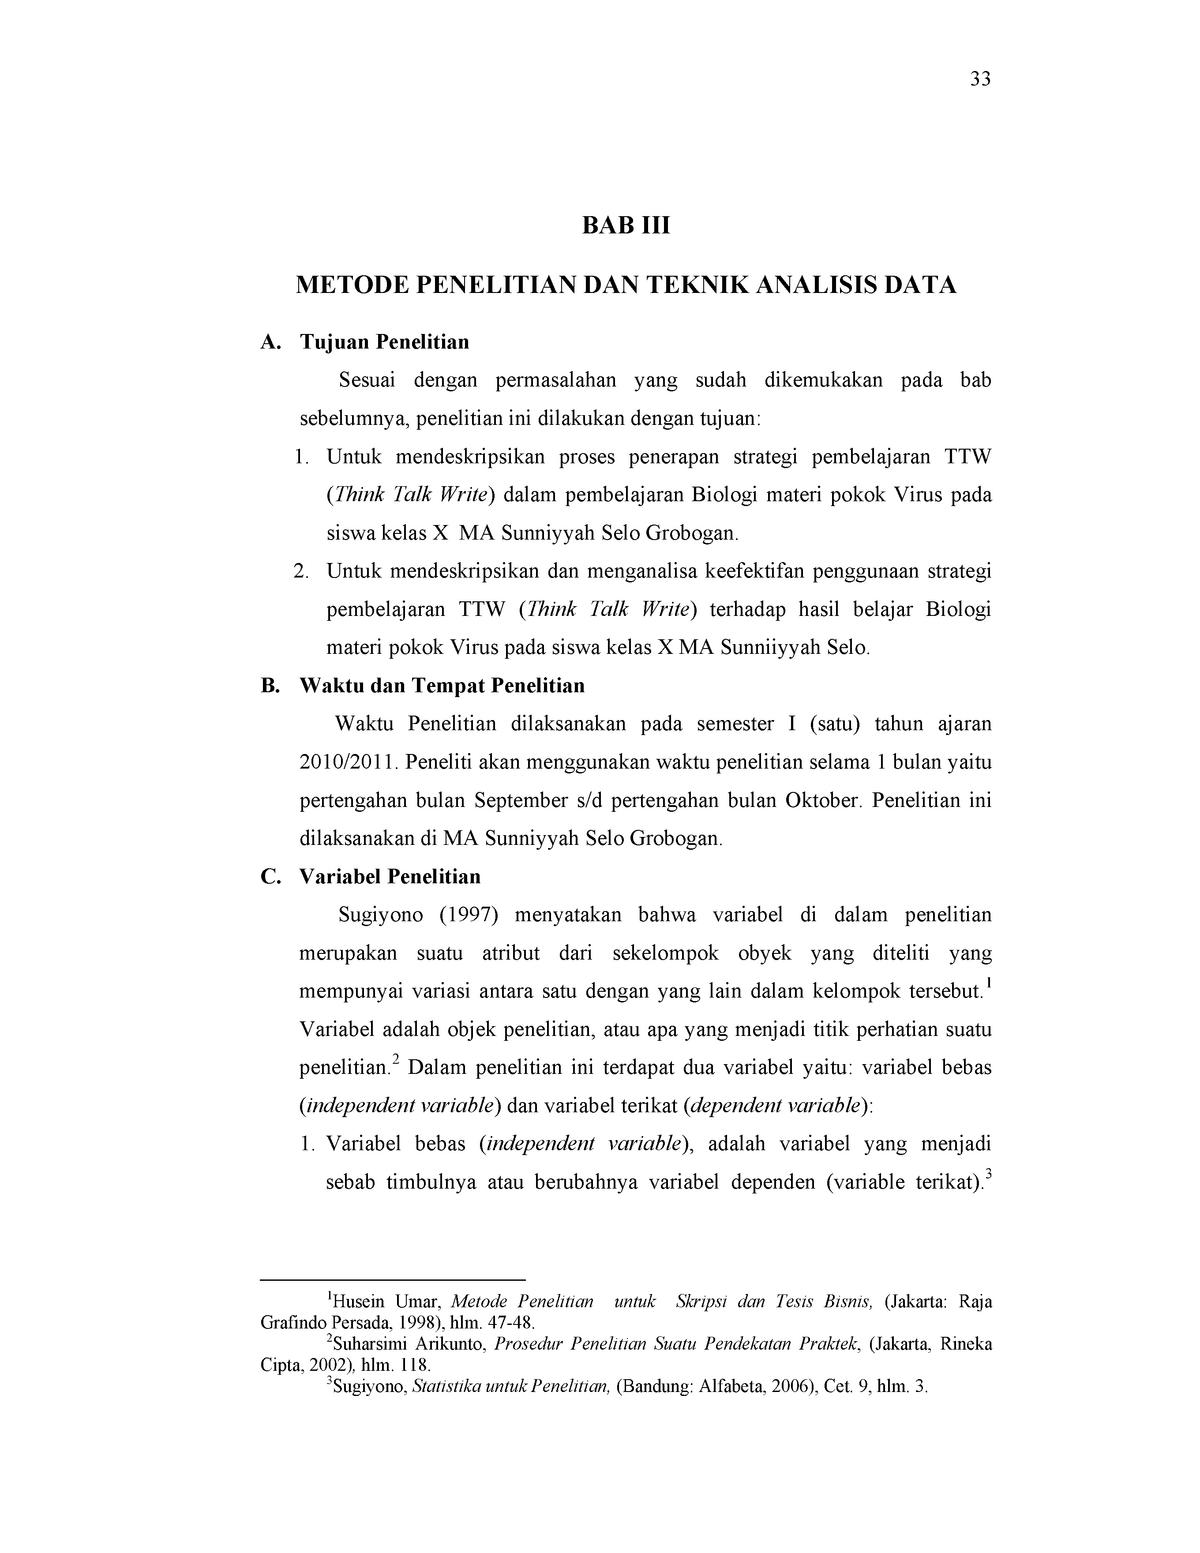 Teknik Analisis Data Matematika Ma1102 Studocu